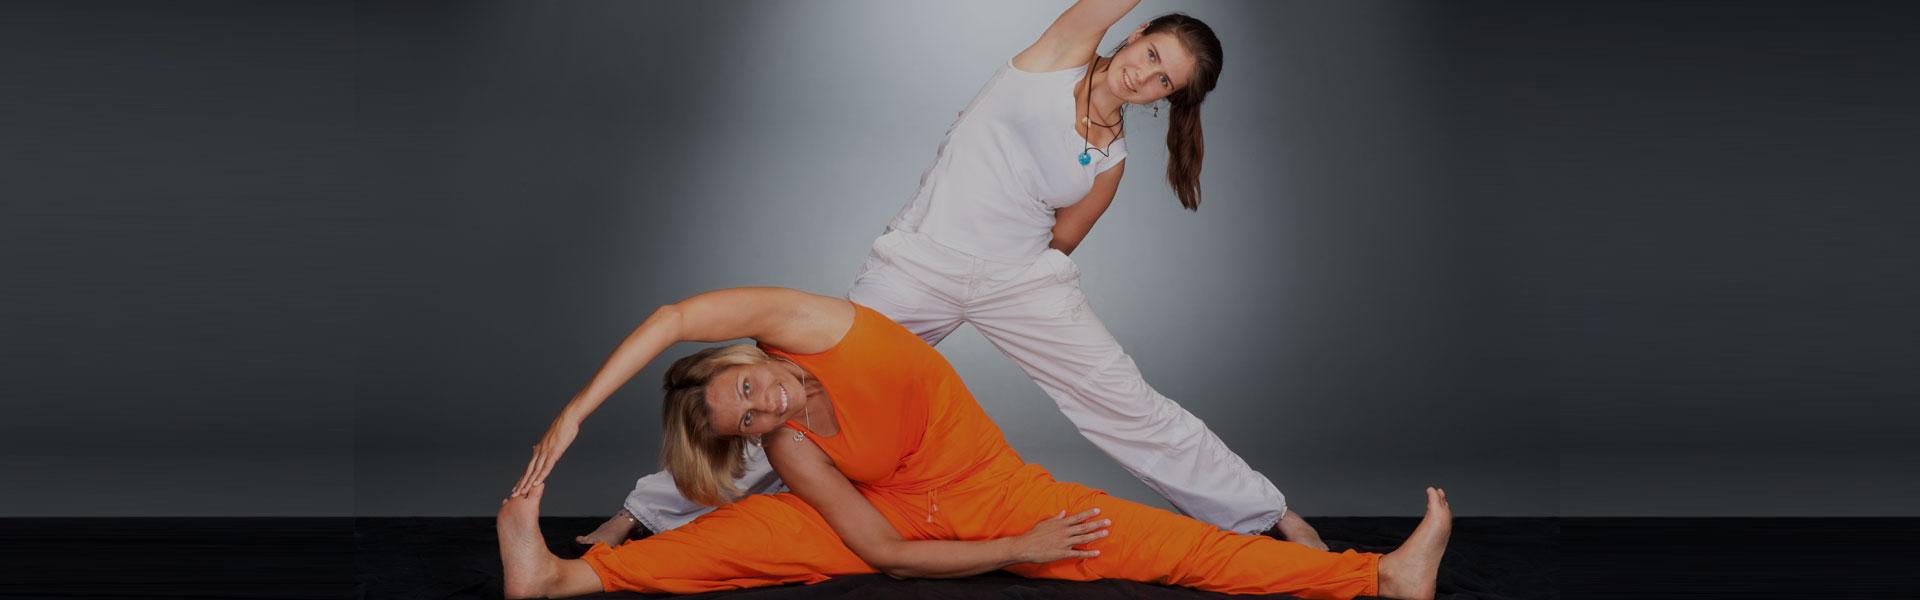 feblissa-yoga